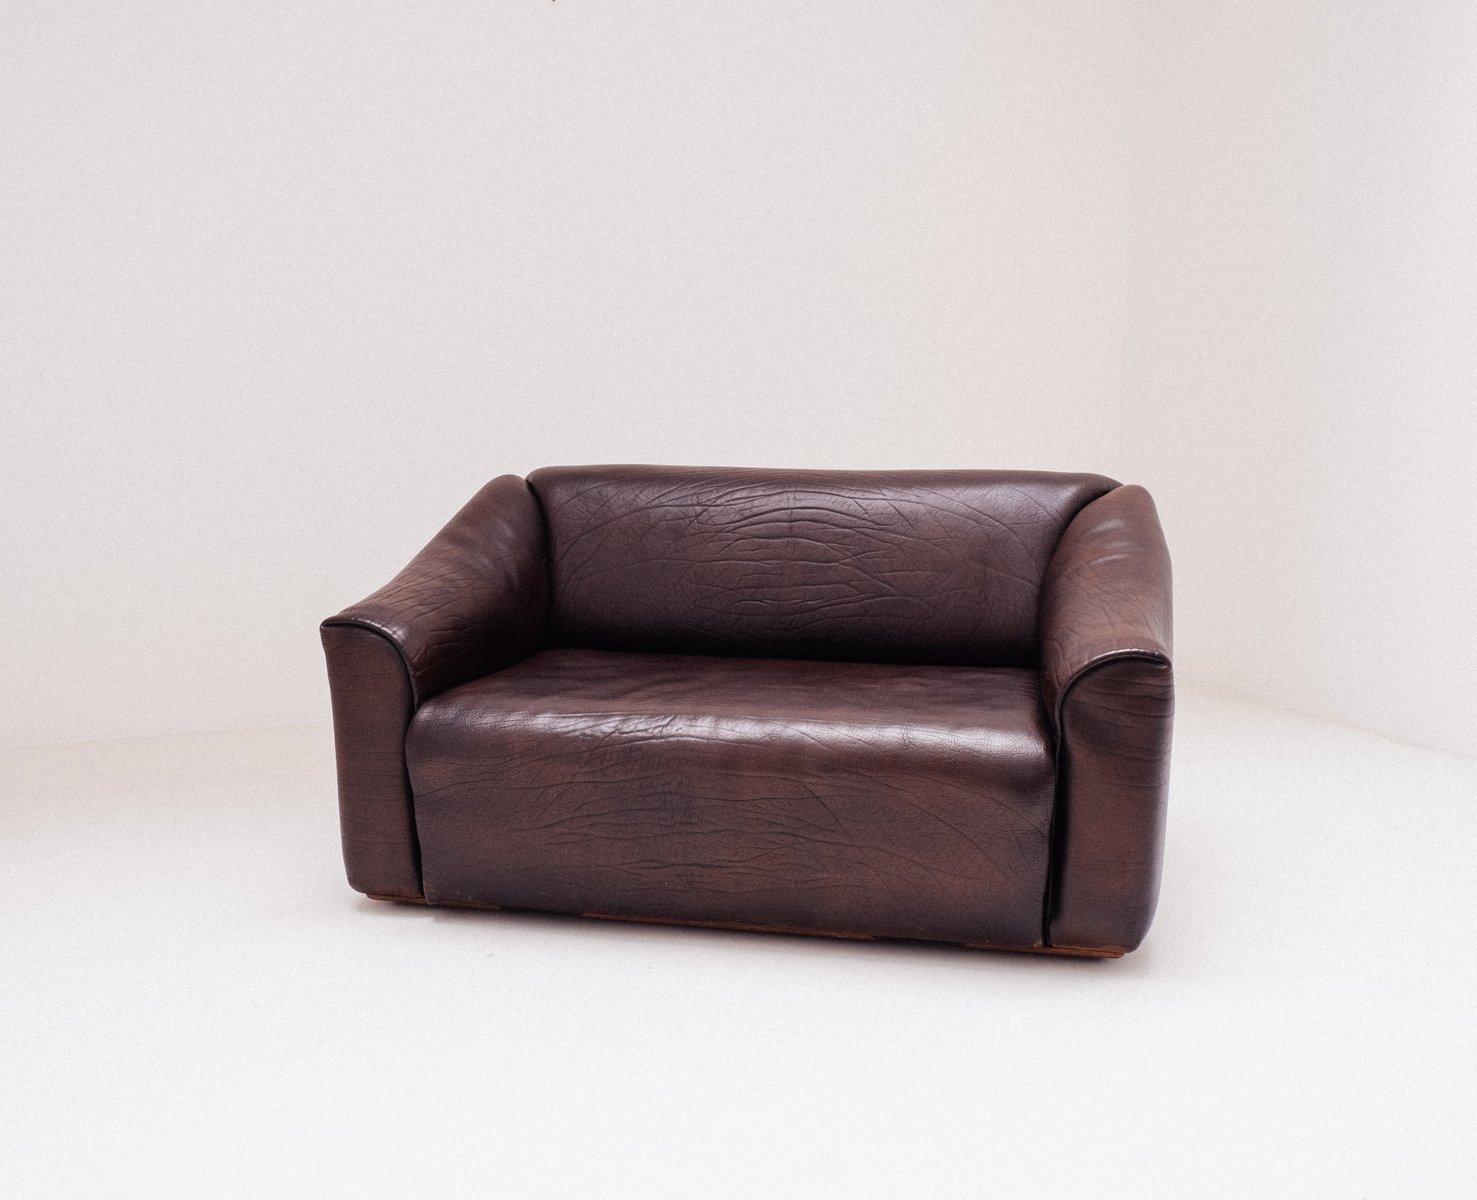 Schokoladenbraunes DS 47 2-Sitzer Sofa von de Sede, 1970er